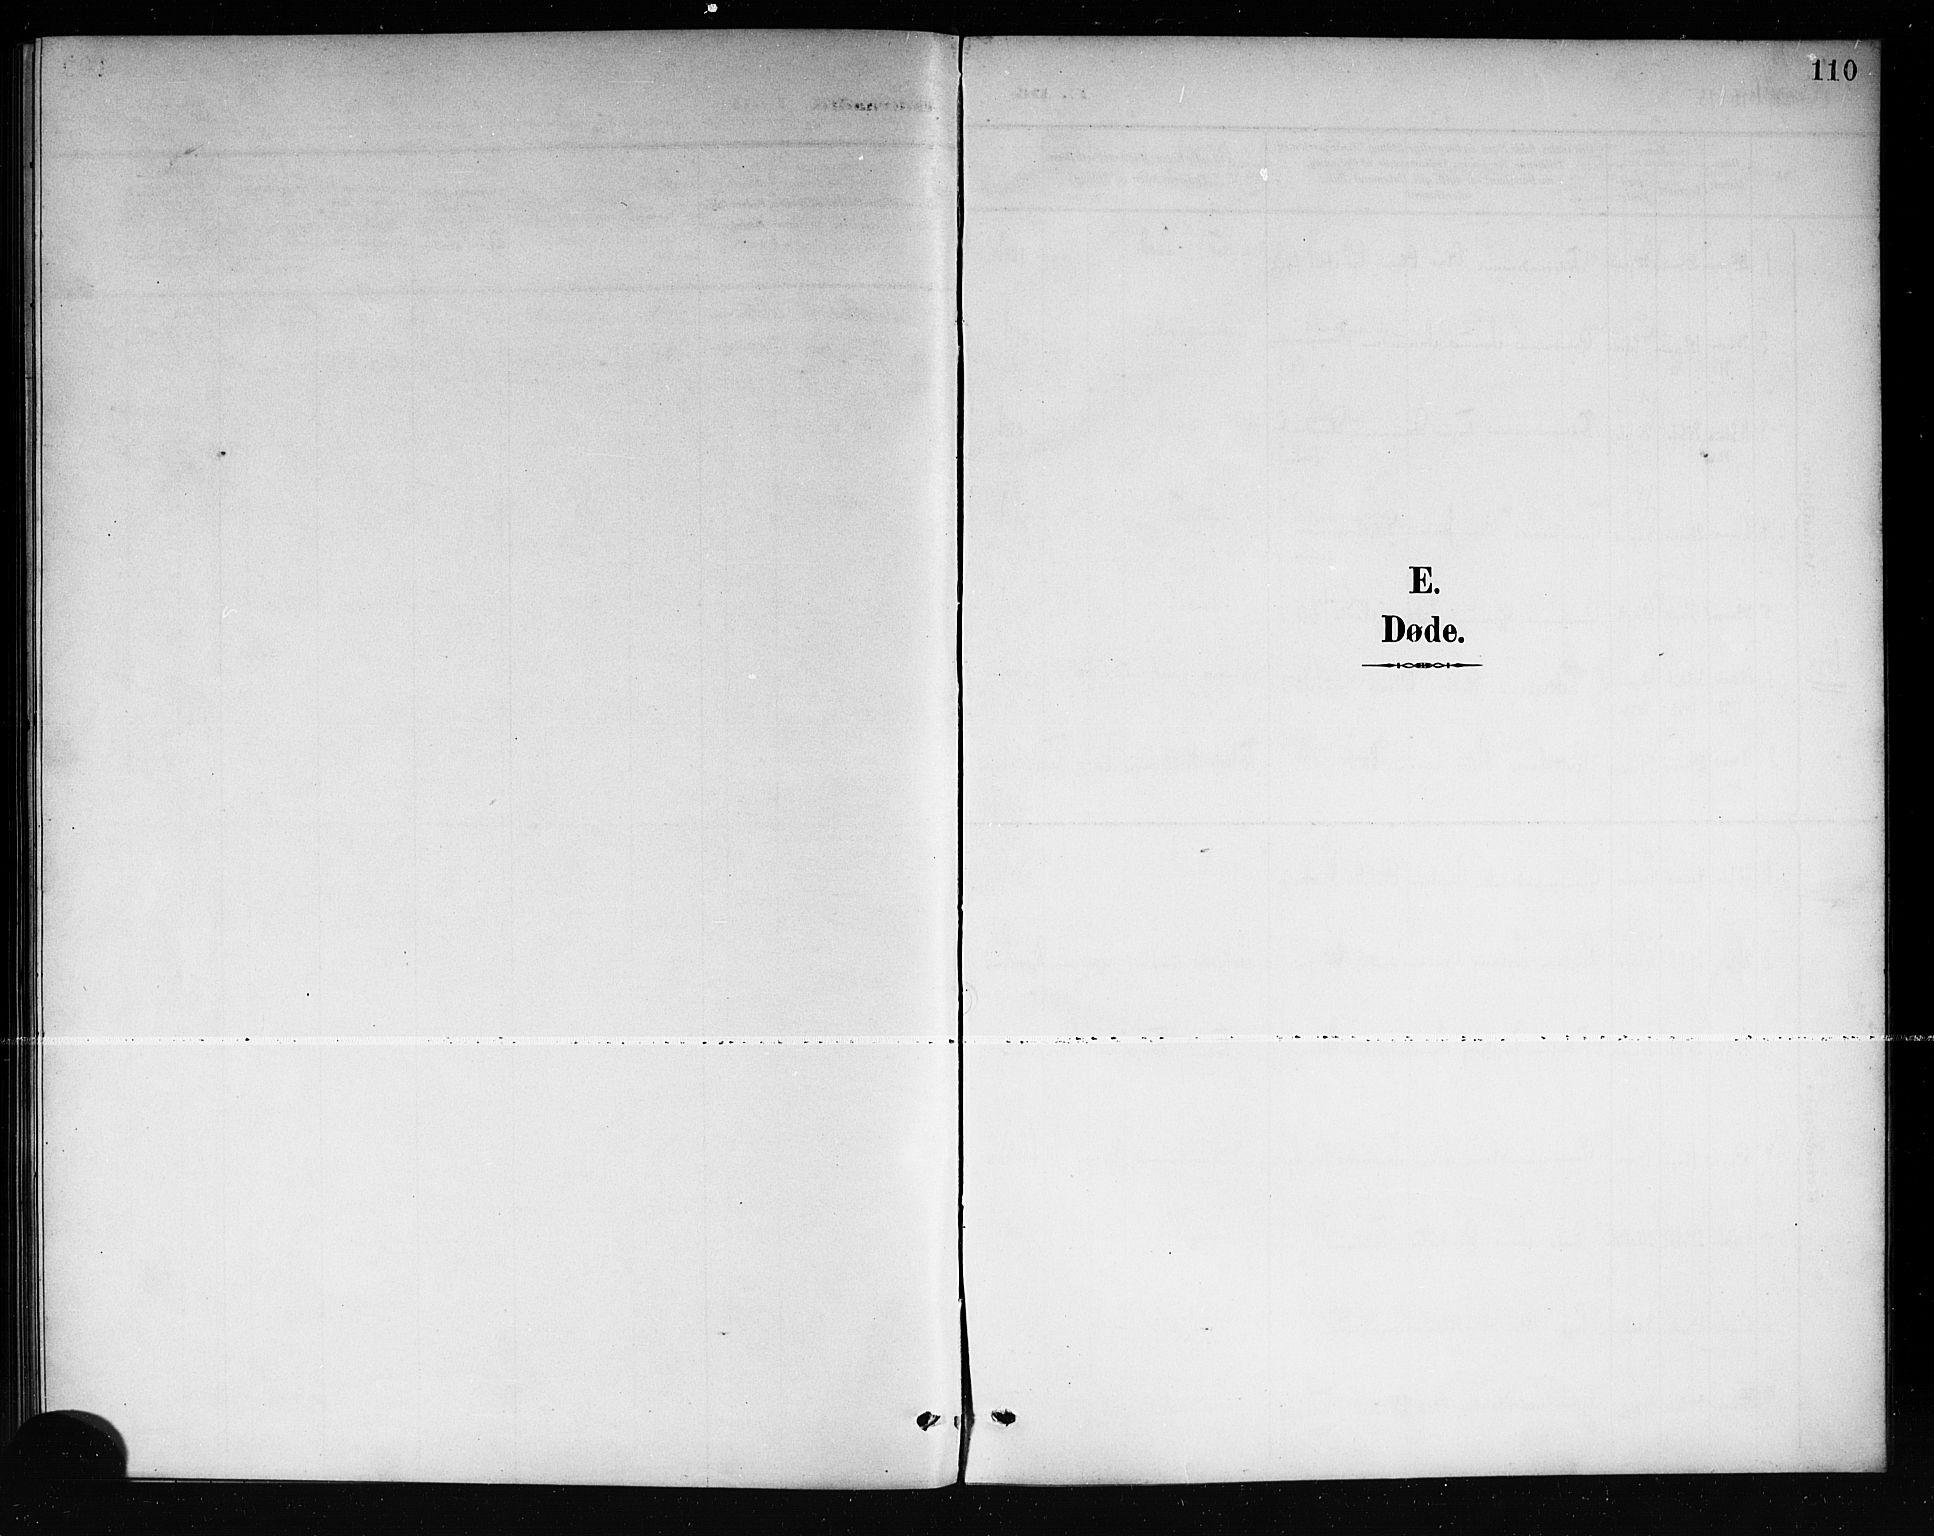 SAKO, Mo kirkebøker, G/Ga/L0002: Klokkerbok nr. I 2, 1892-1914, s. 110